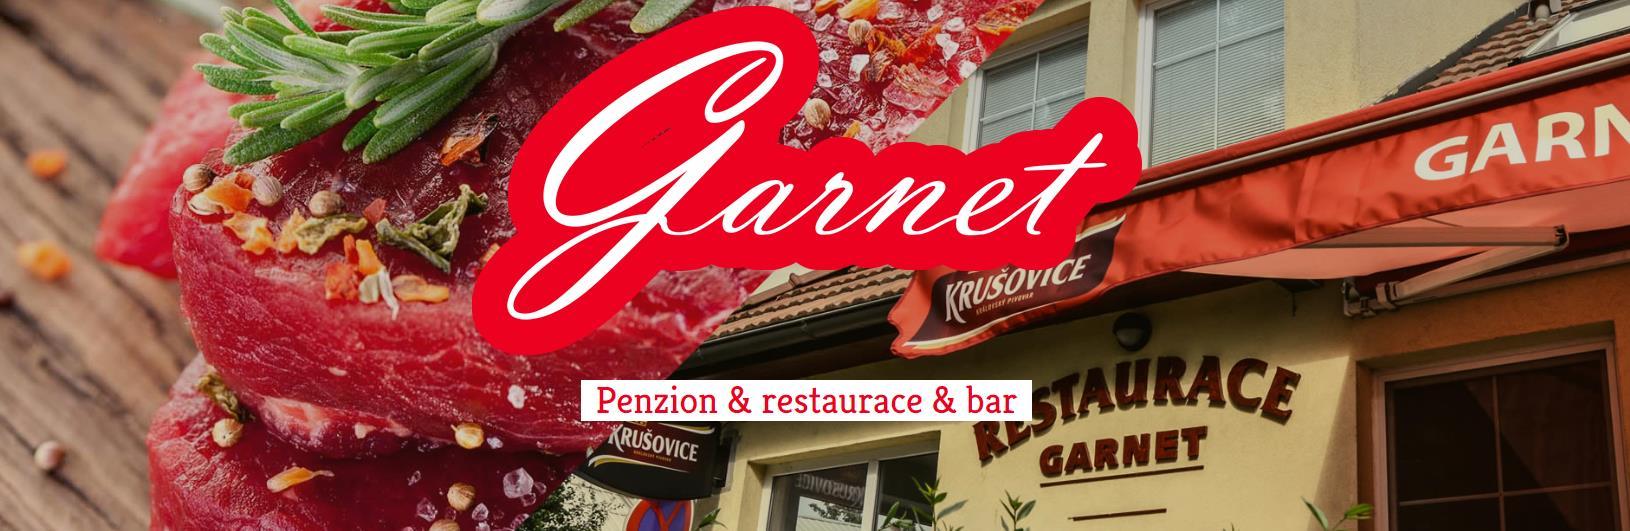 Garnet penzion